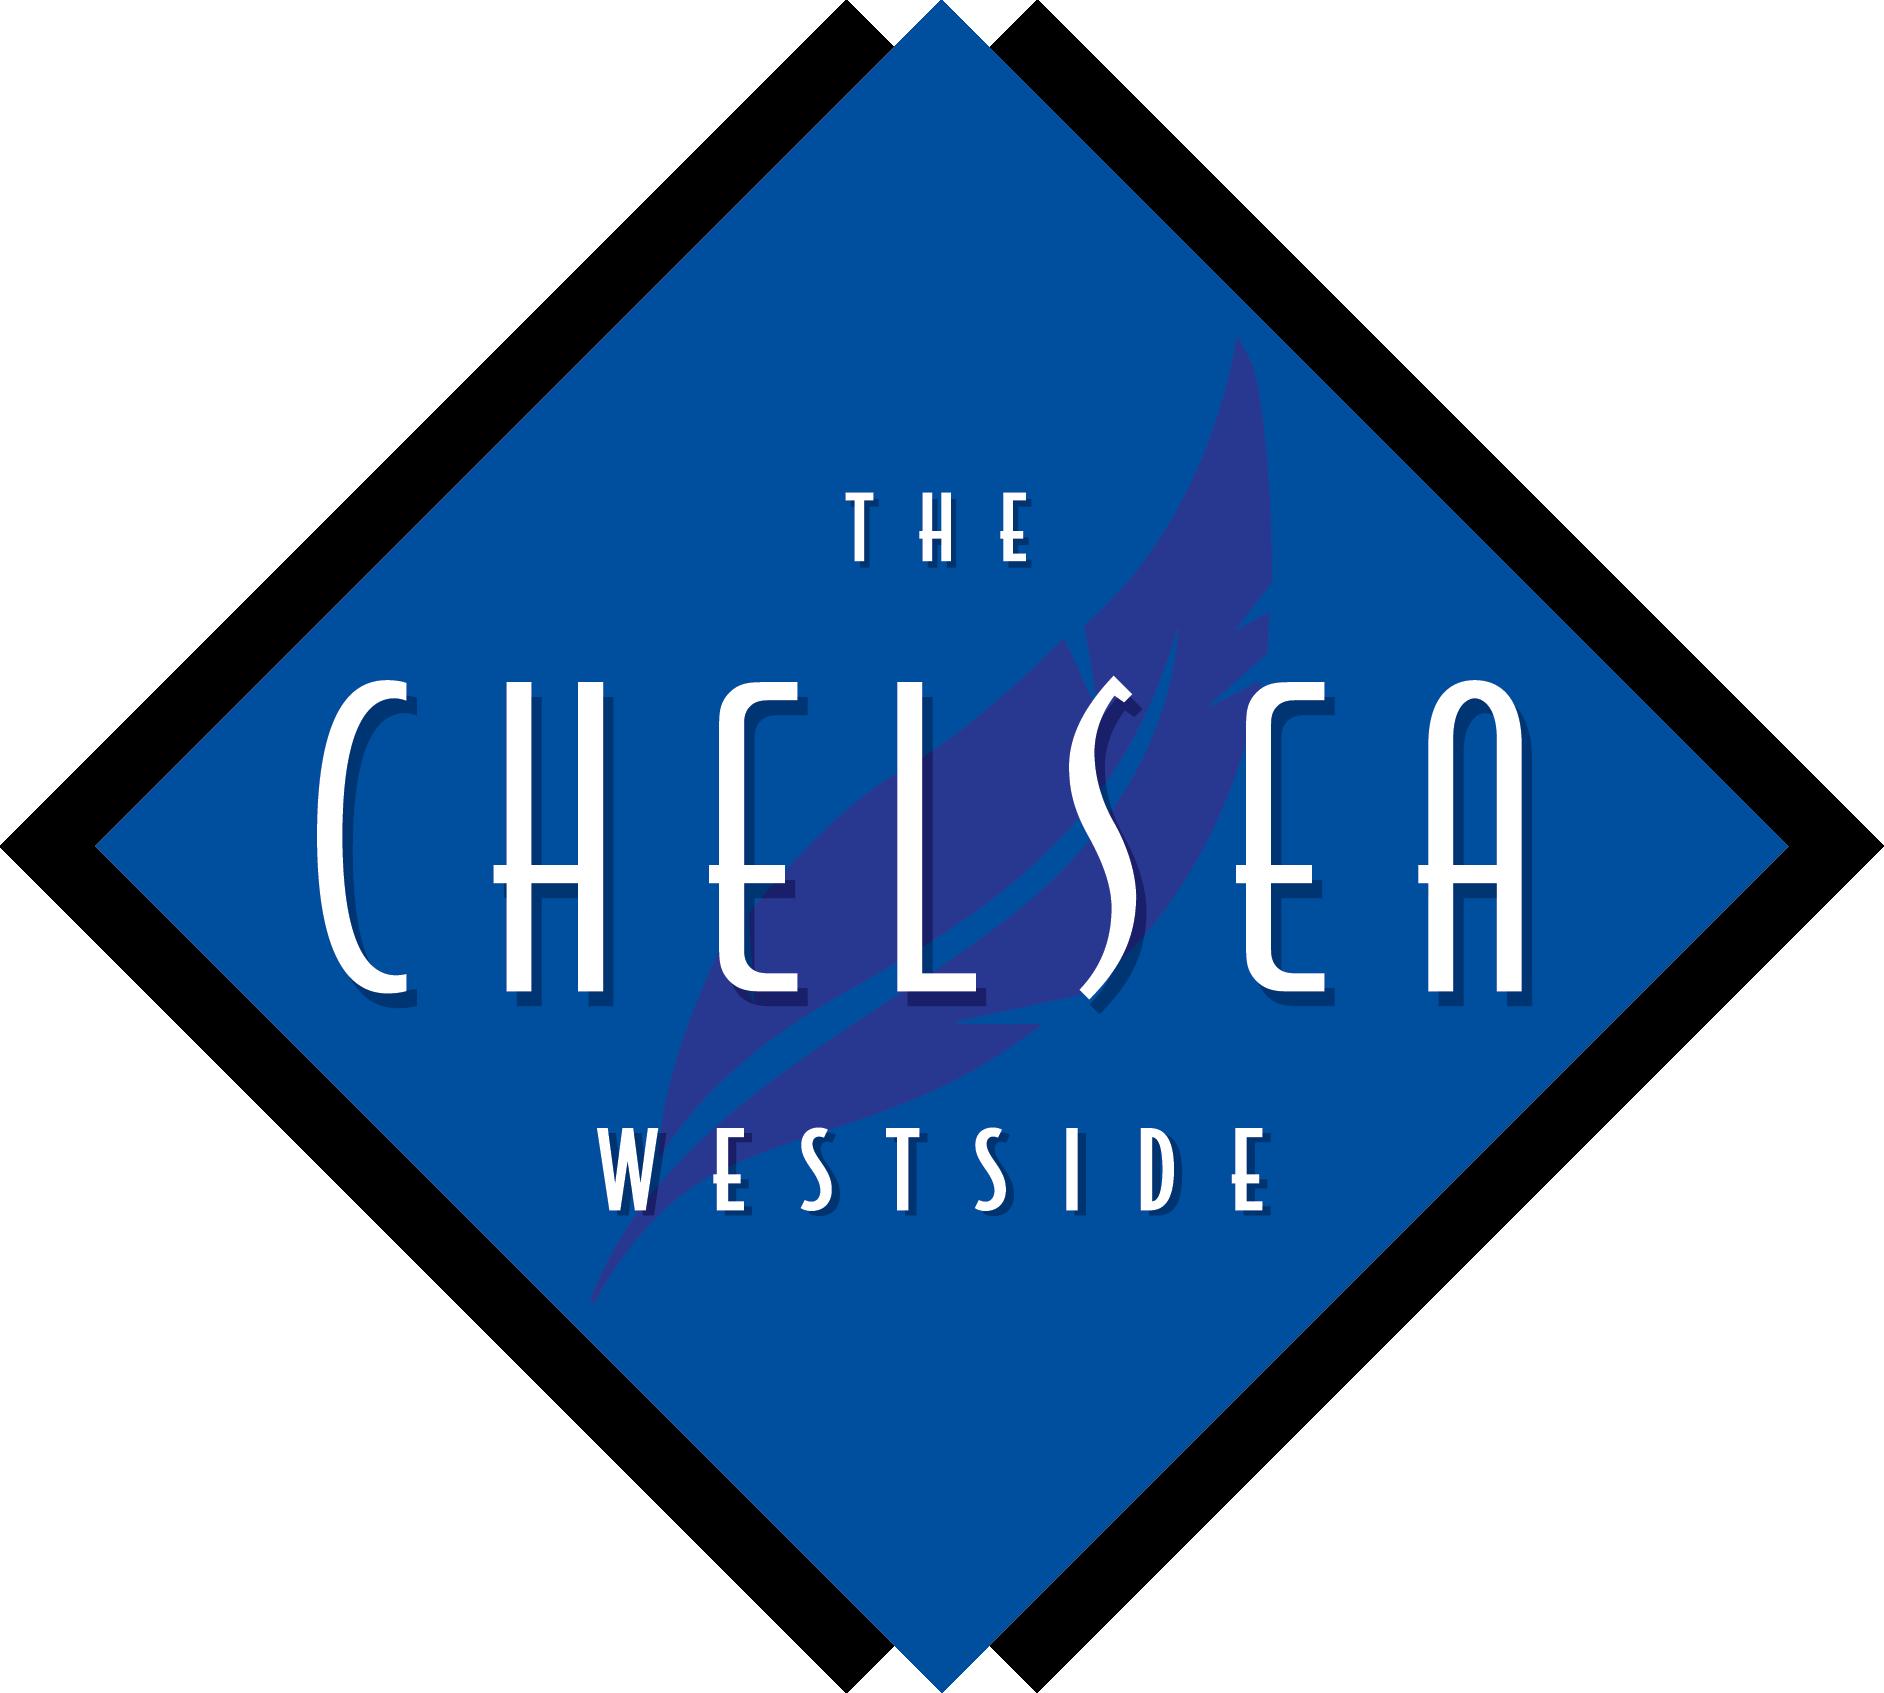 The Chelsea Westside